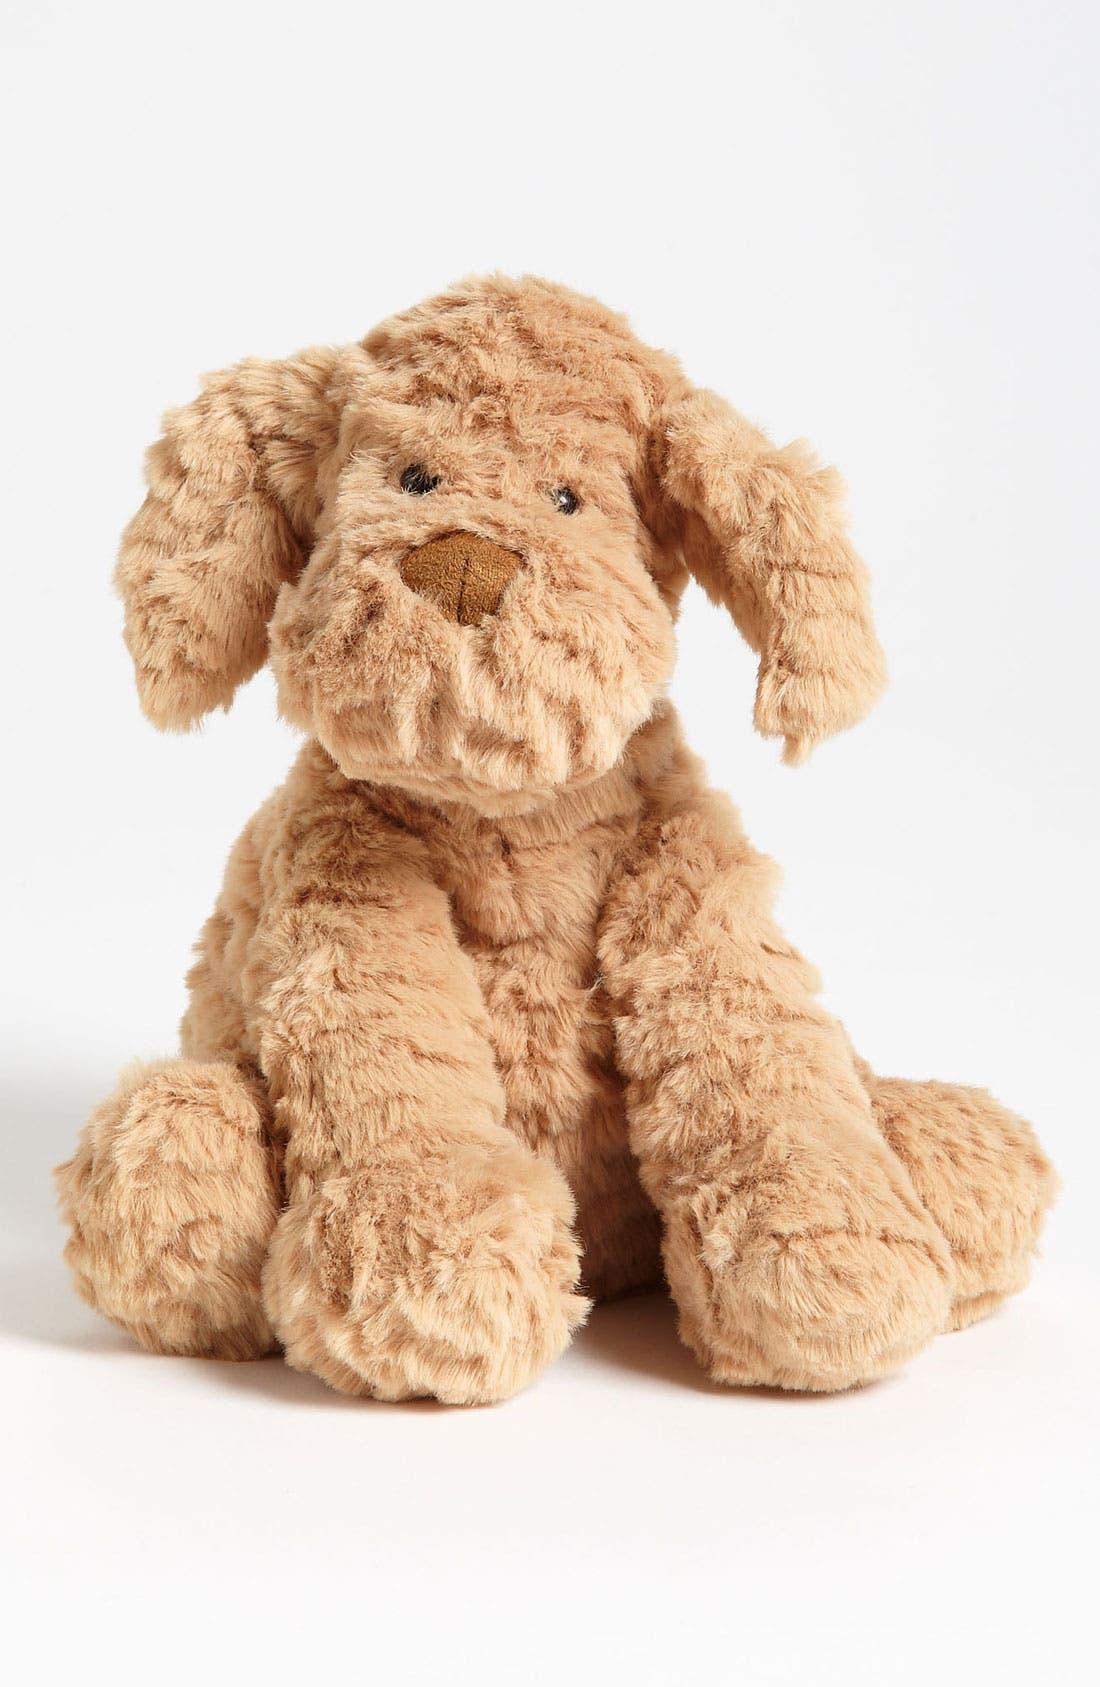 Alternate Image 1 Selected - Jellycat 'Fuddlewuddle Puppy' Stuffed Animal